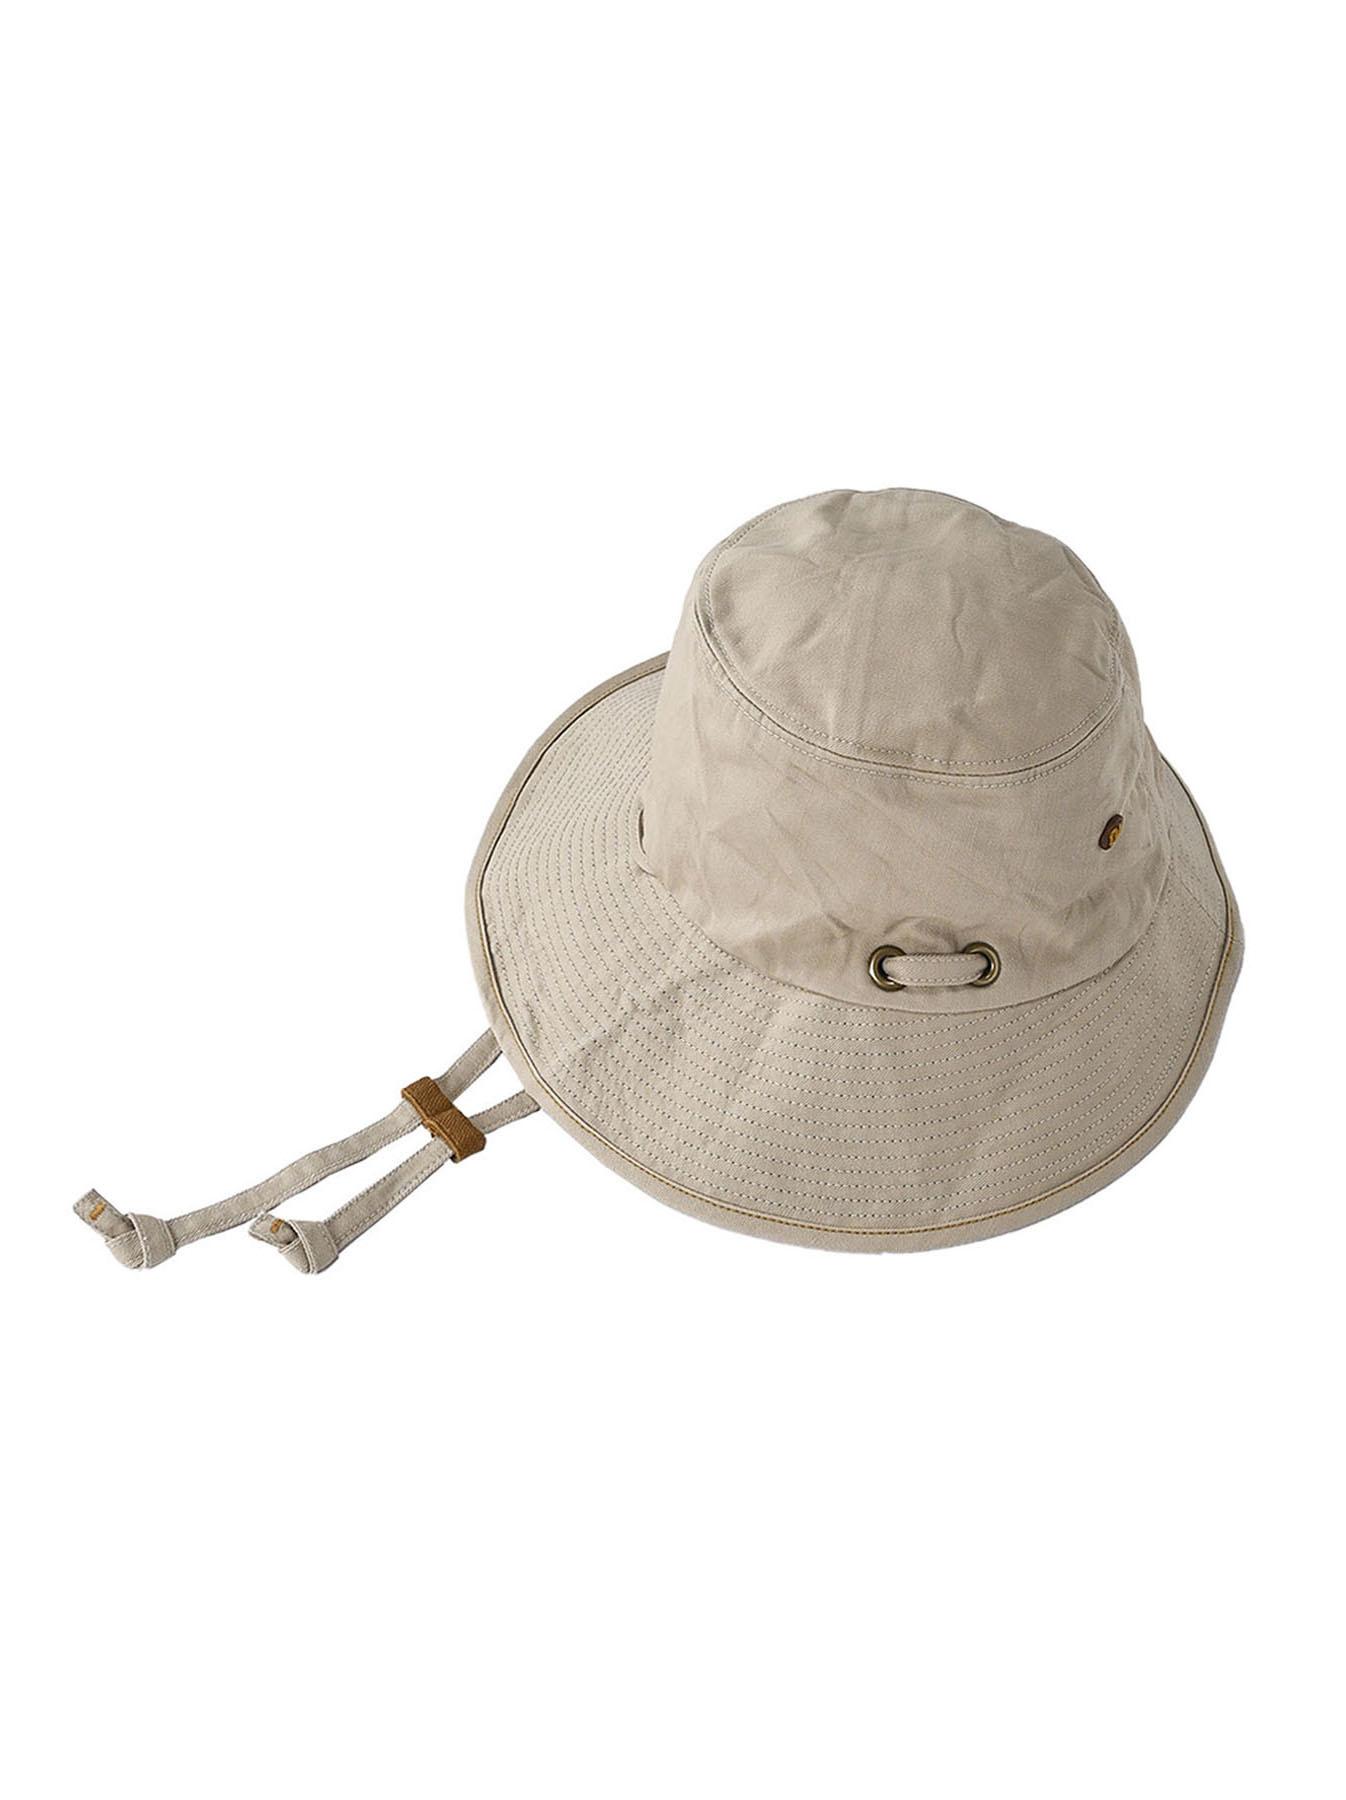 Okome Chino Sail Hat (0521)-4